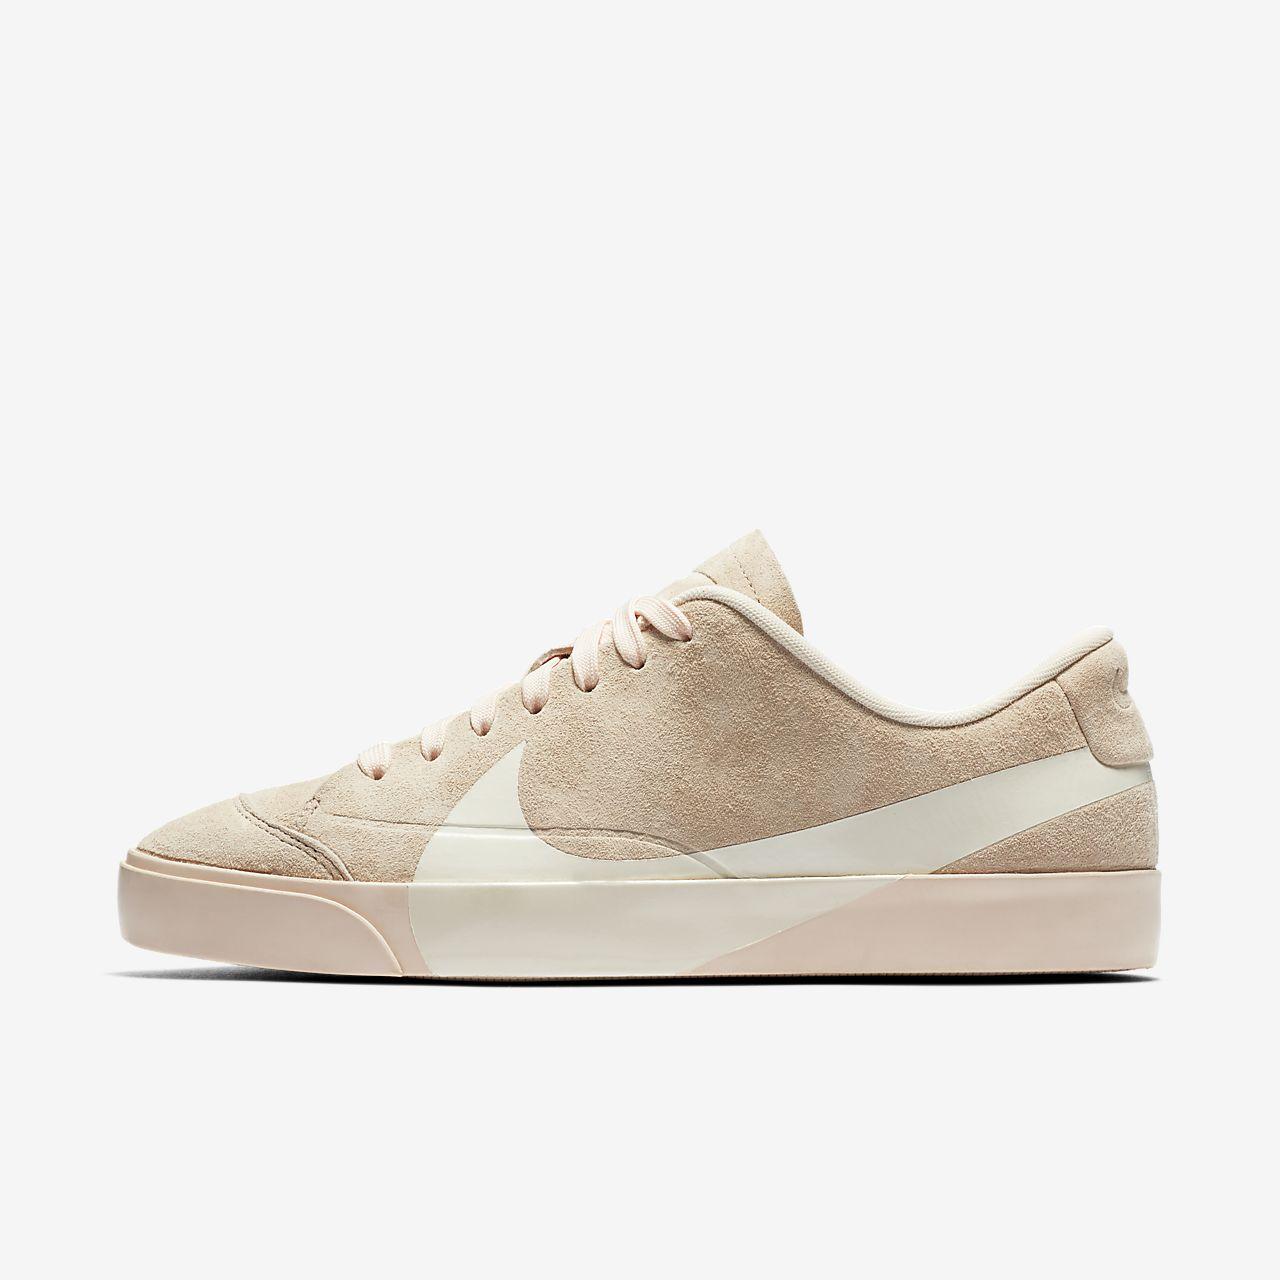 ... where to buy scarpa nike blazer city low lx donna d04b2 0ed1a e3086009d34